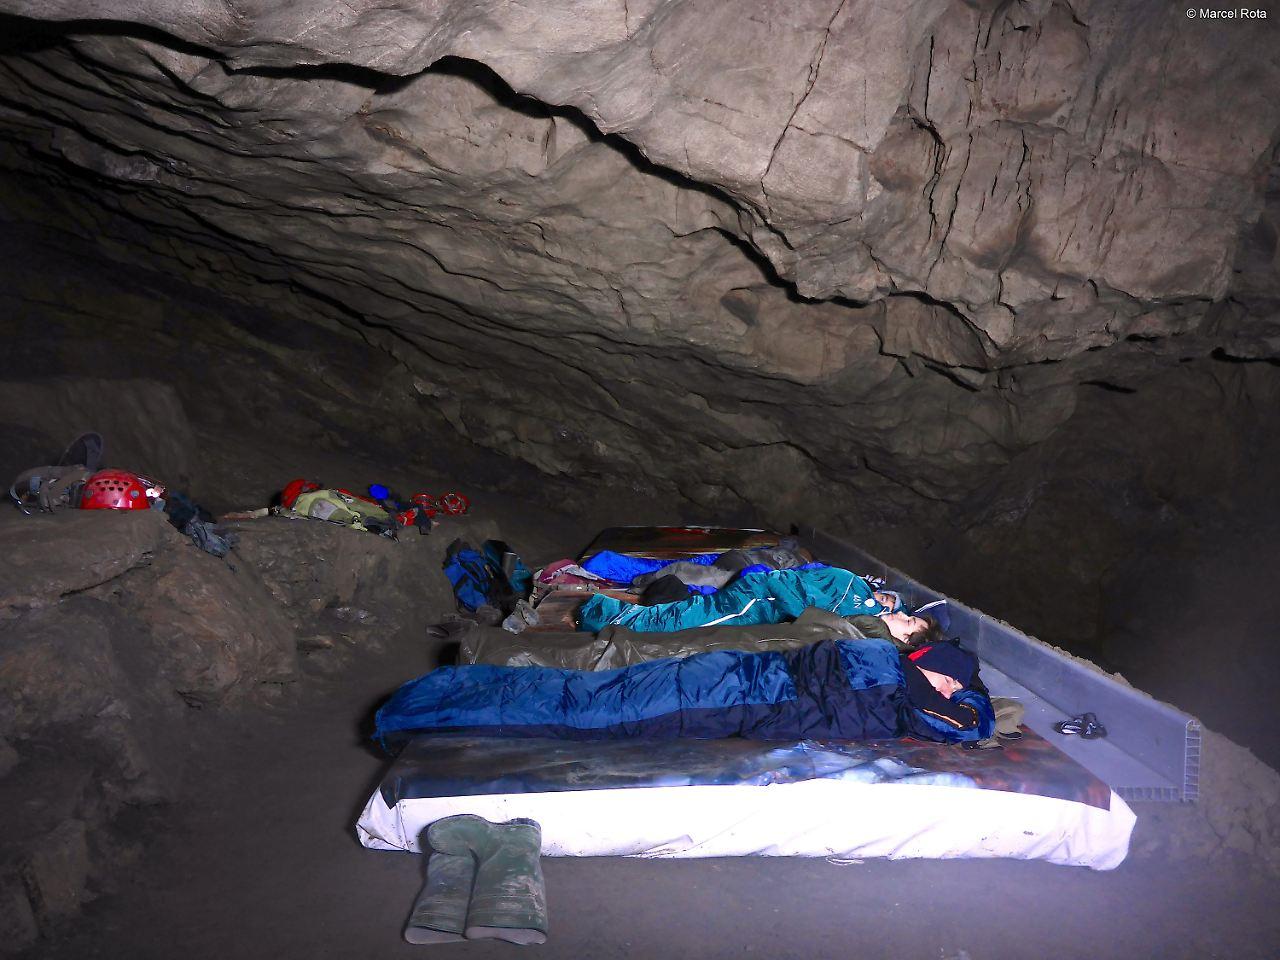 Profi-Kletterer befreien eingeschlossene Touristen aus 300 Meter tiefer Höhle